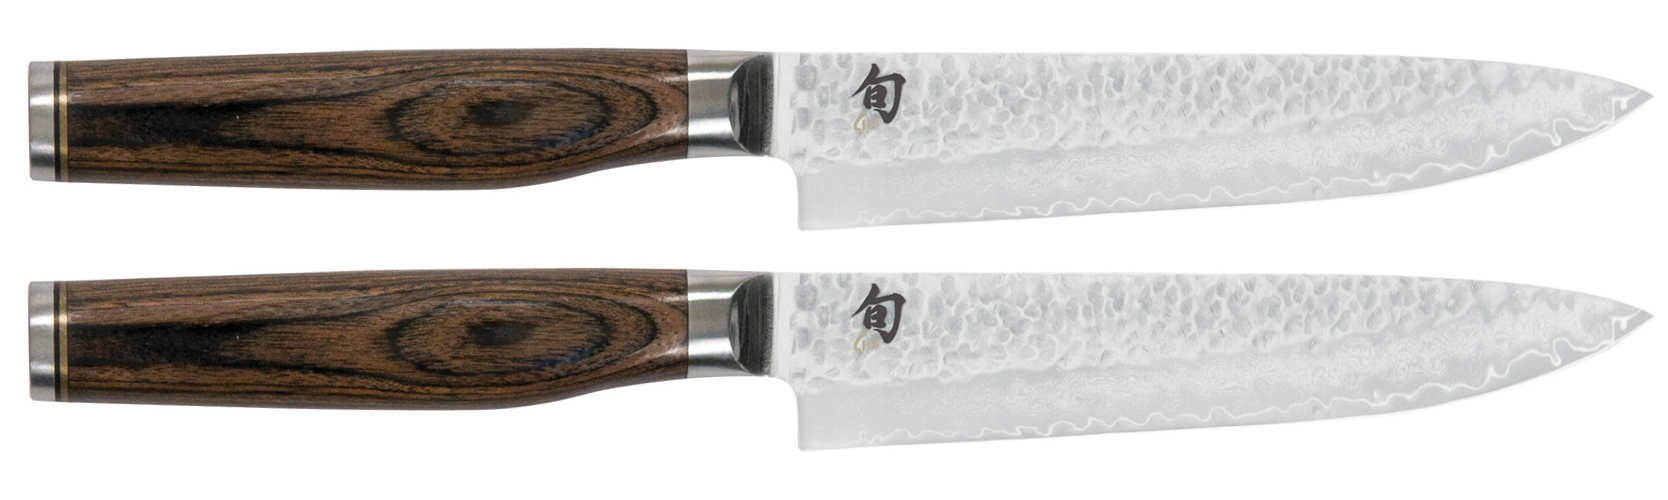 KAI Shun Premier steak knife set